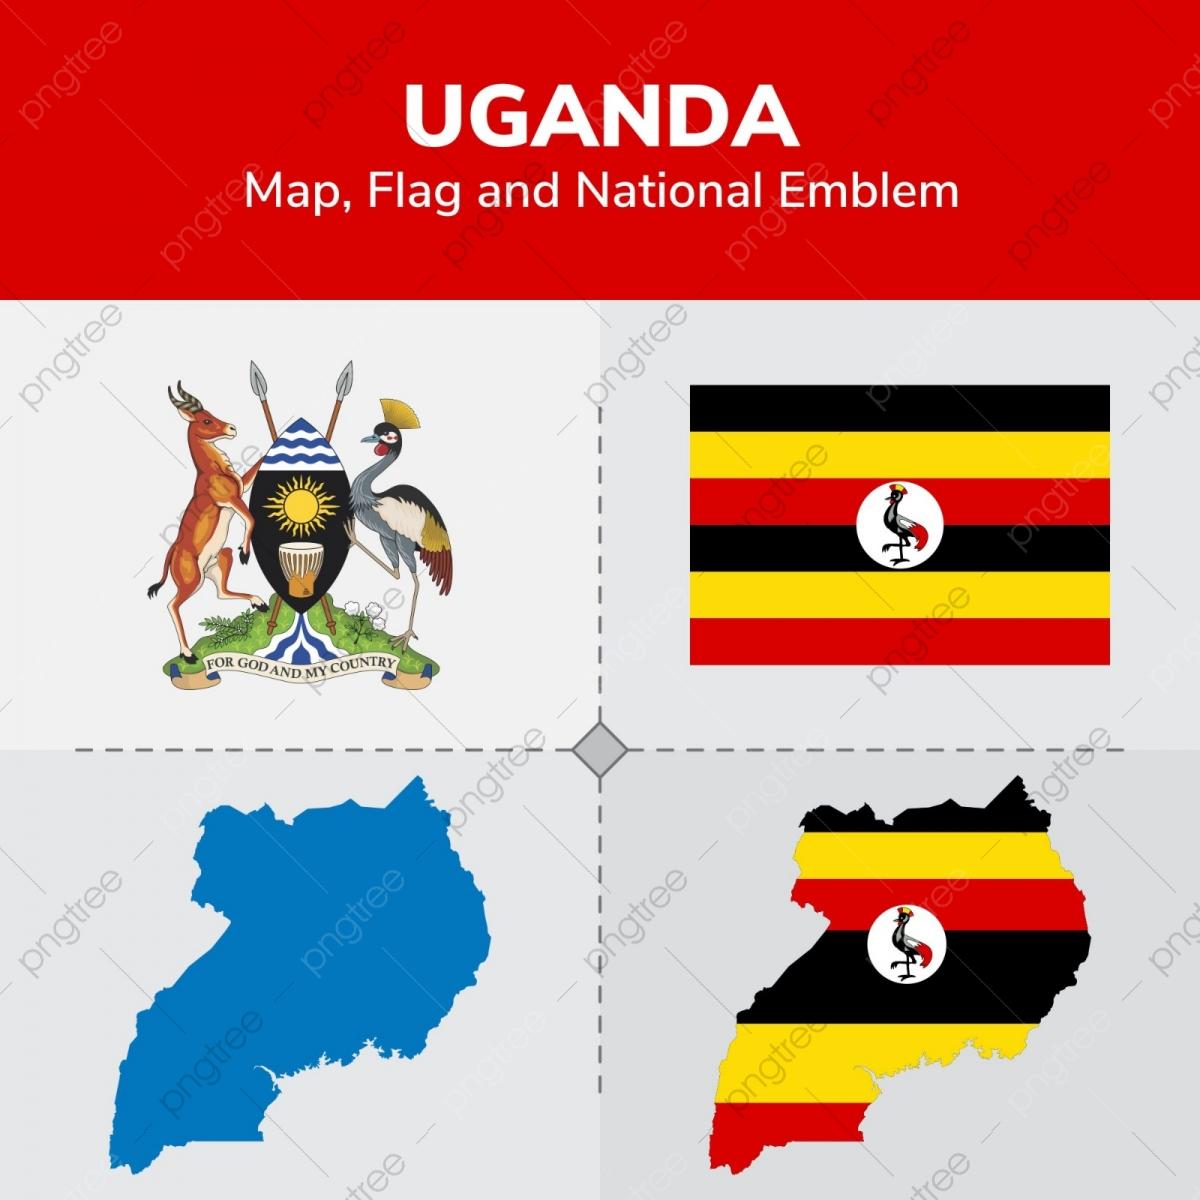 Uganda Map Flag And National Emblem, Continents, Countries